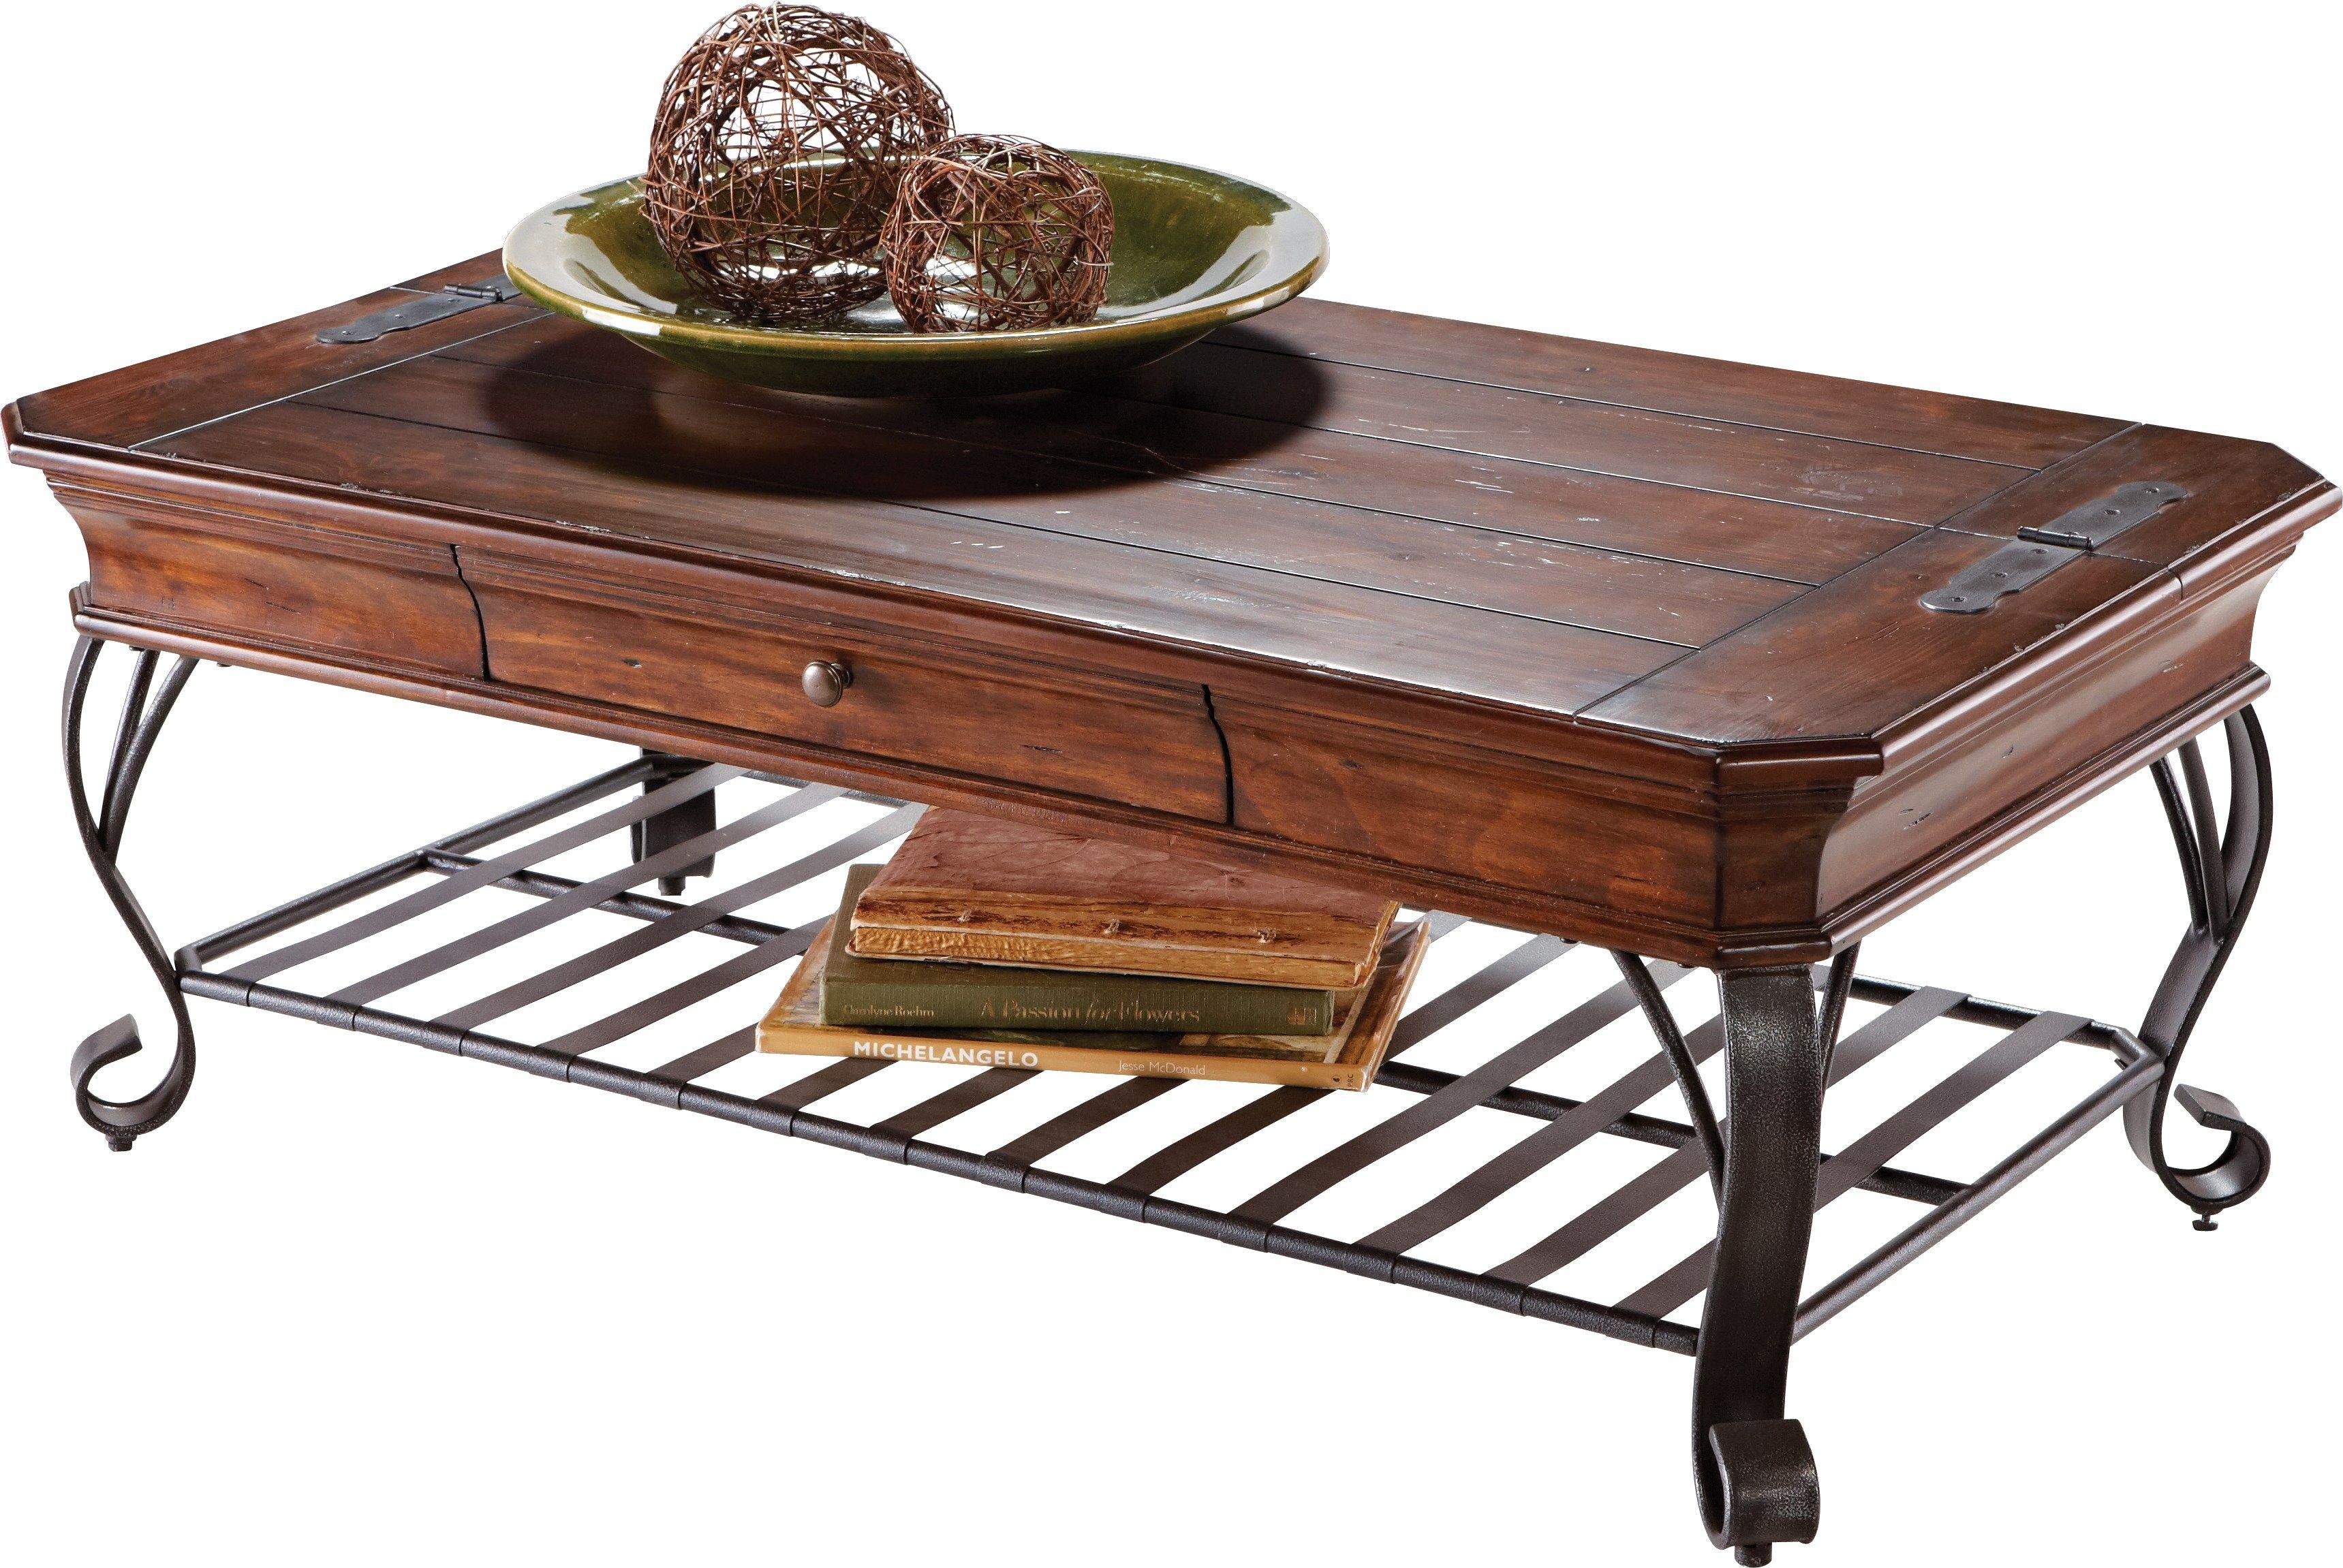 Coronado Bay Pine Cocktail Table Living Room Coffee Table Coffee Tables For Sale Coffee Table